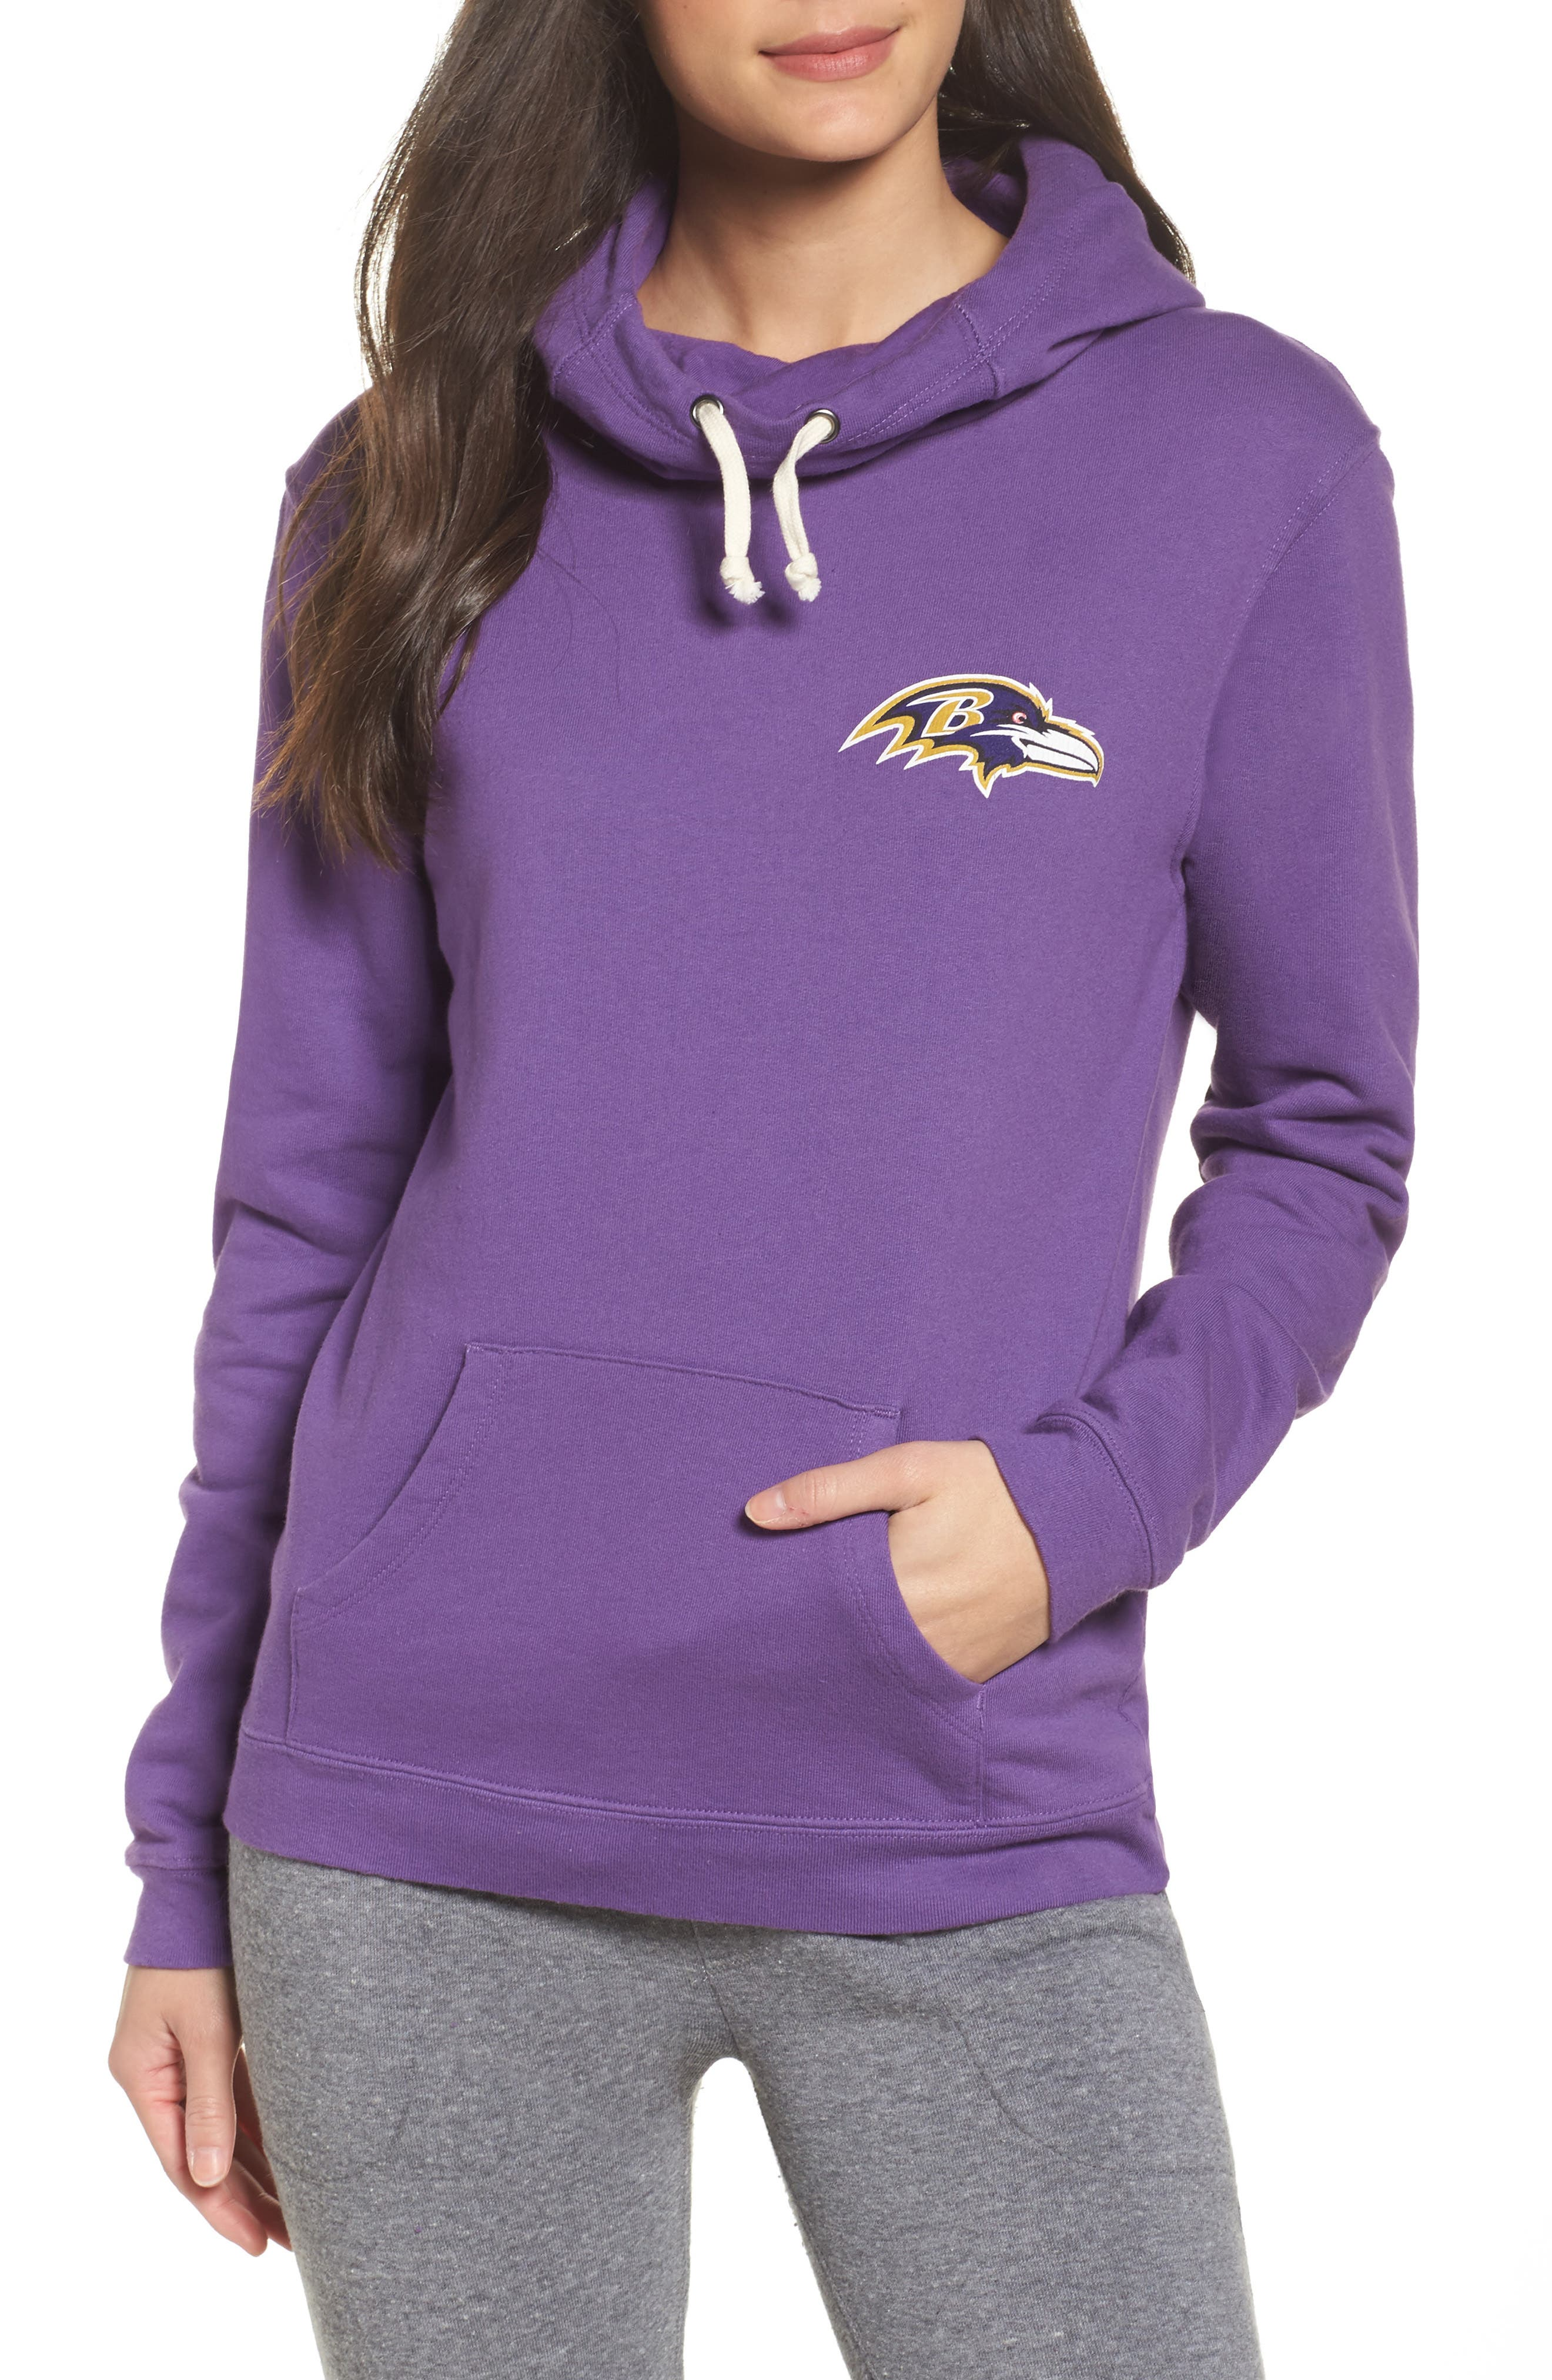 Alternate Image 1 Selected - Junk Food NFL Baltimore Ravens Sunday Hoodie